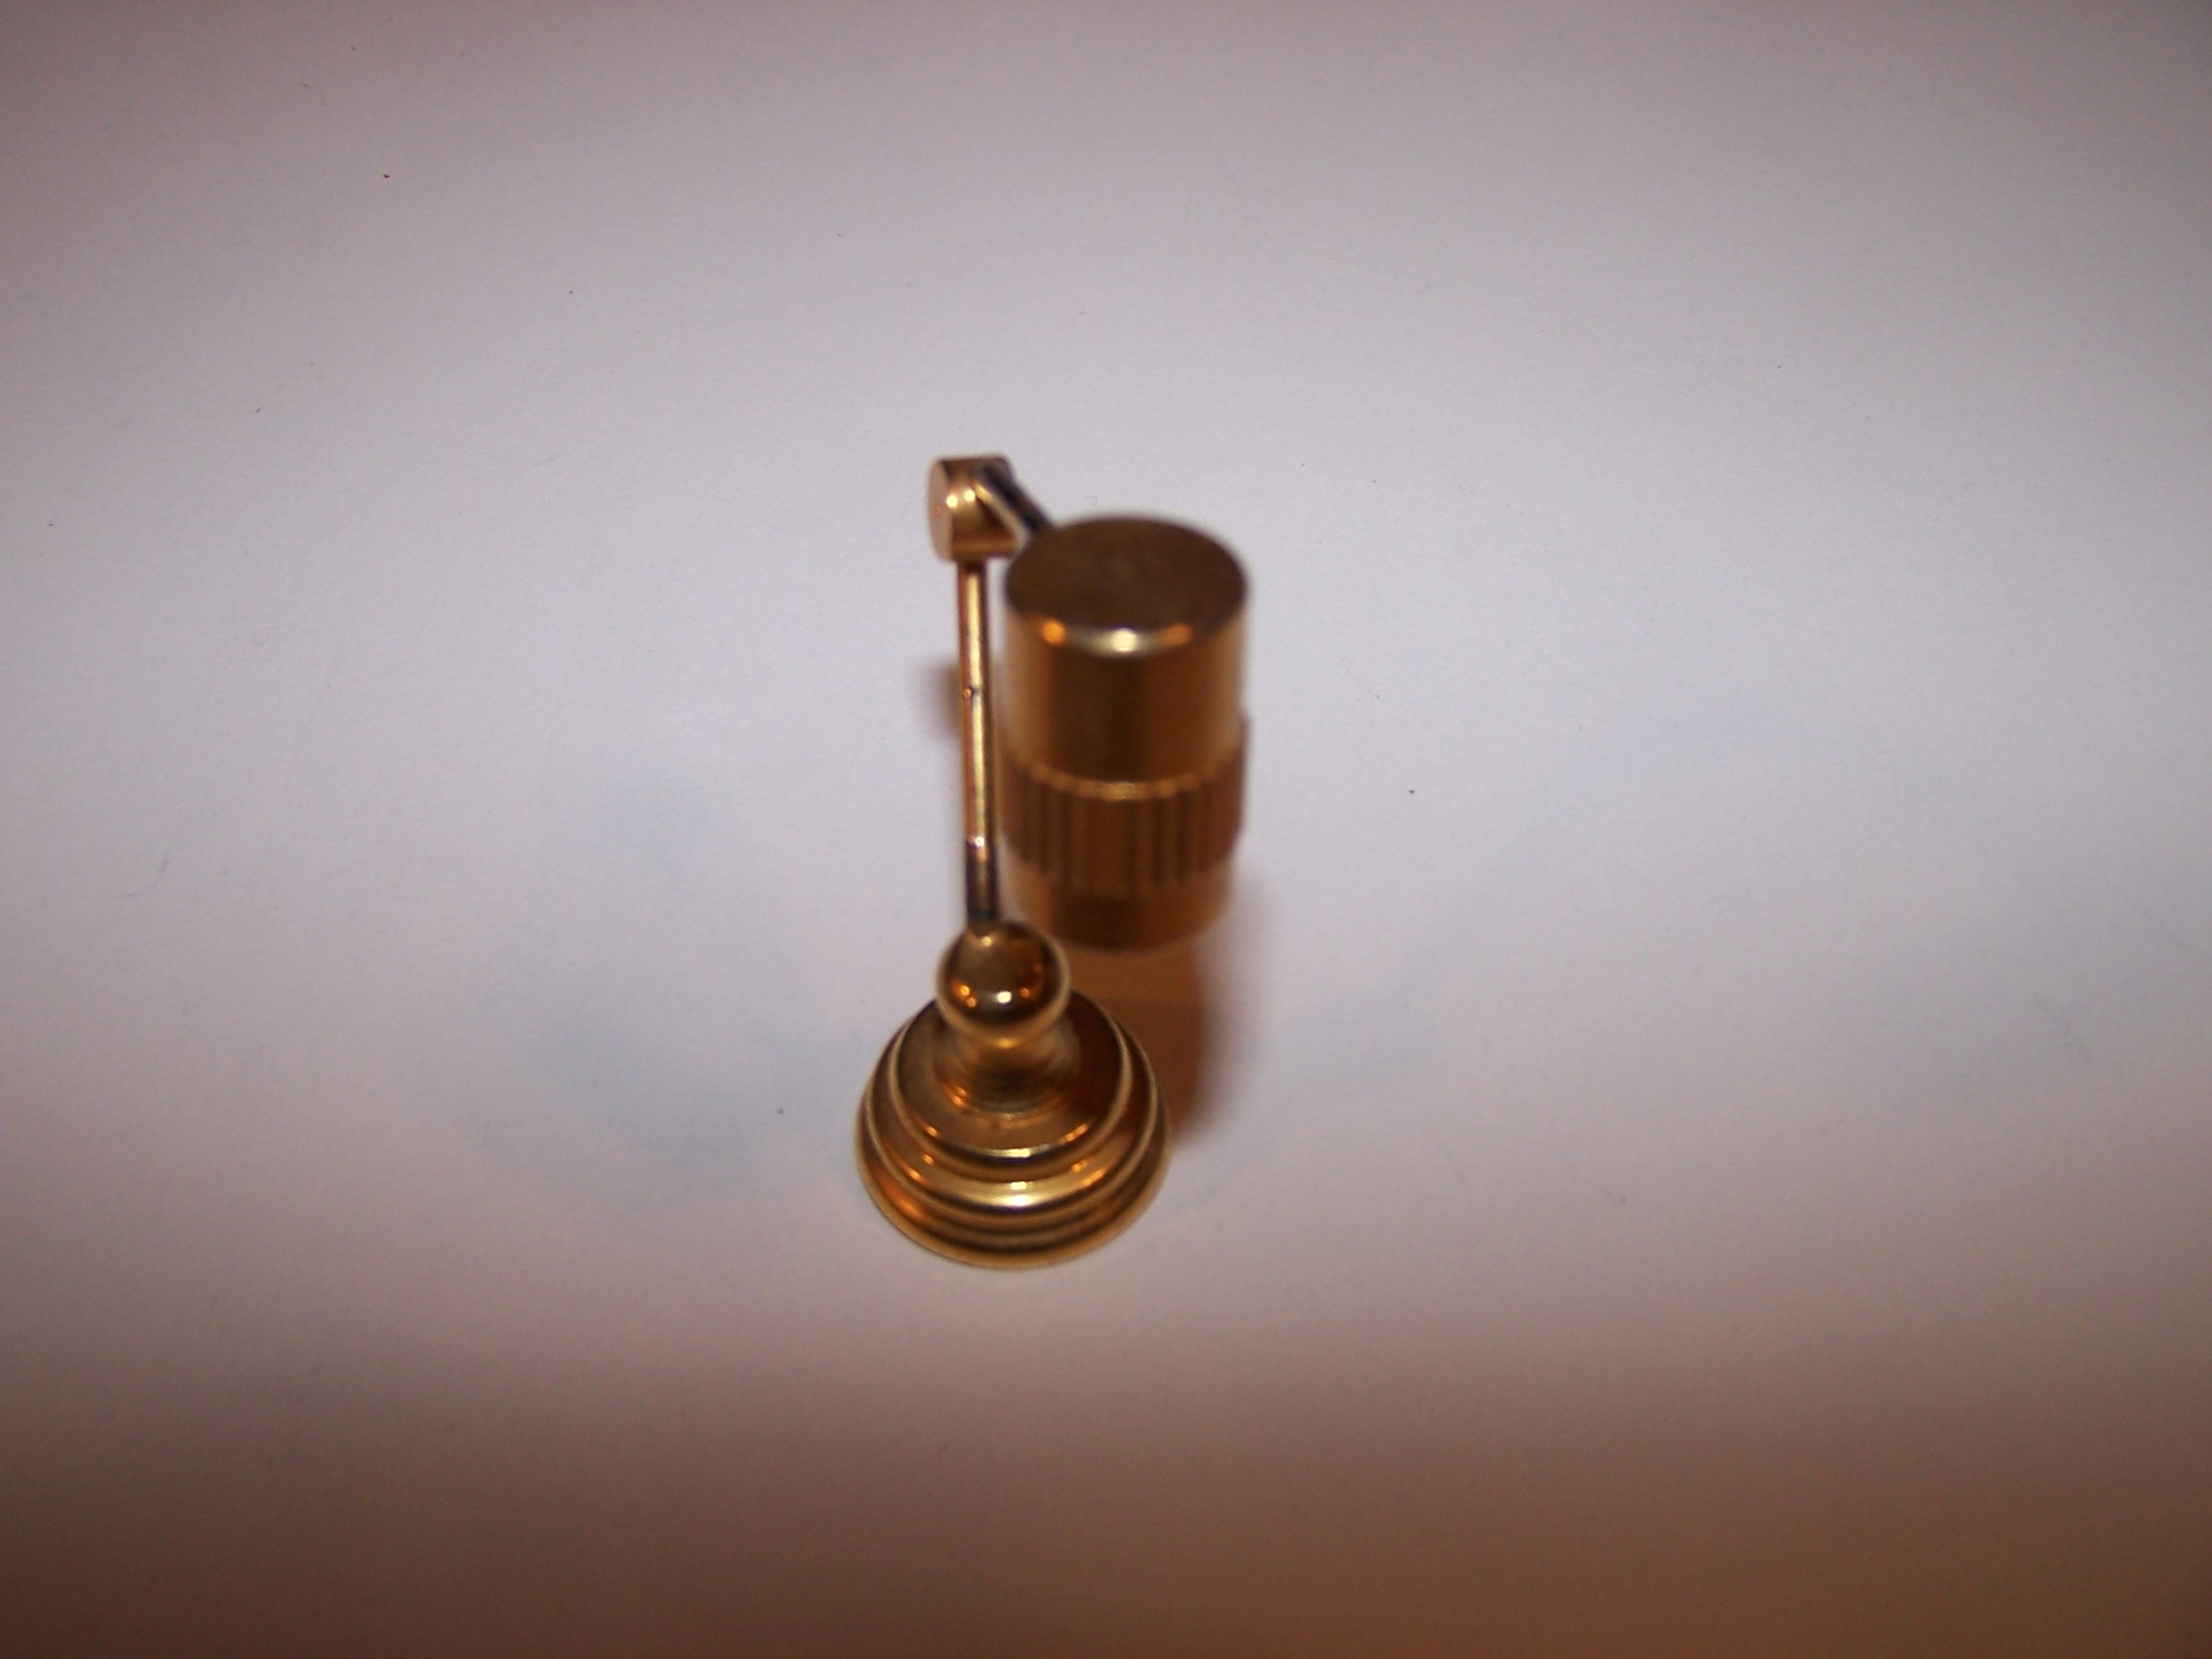 Image 3 of Dollhouse Brass Mod Desk Lamp, Miniature